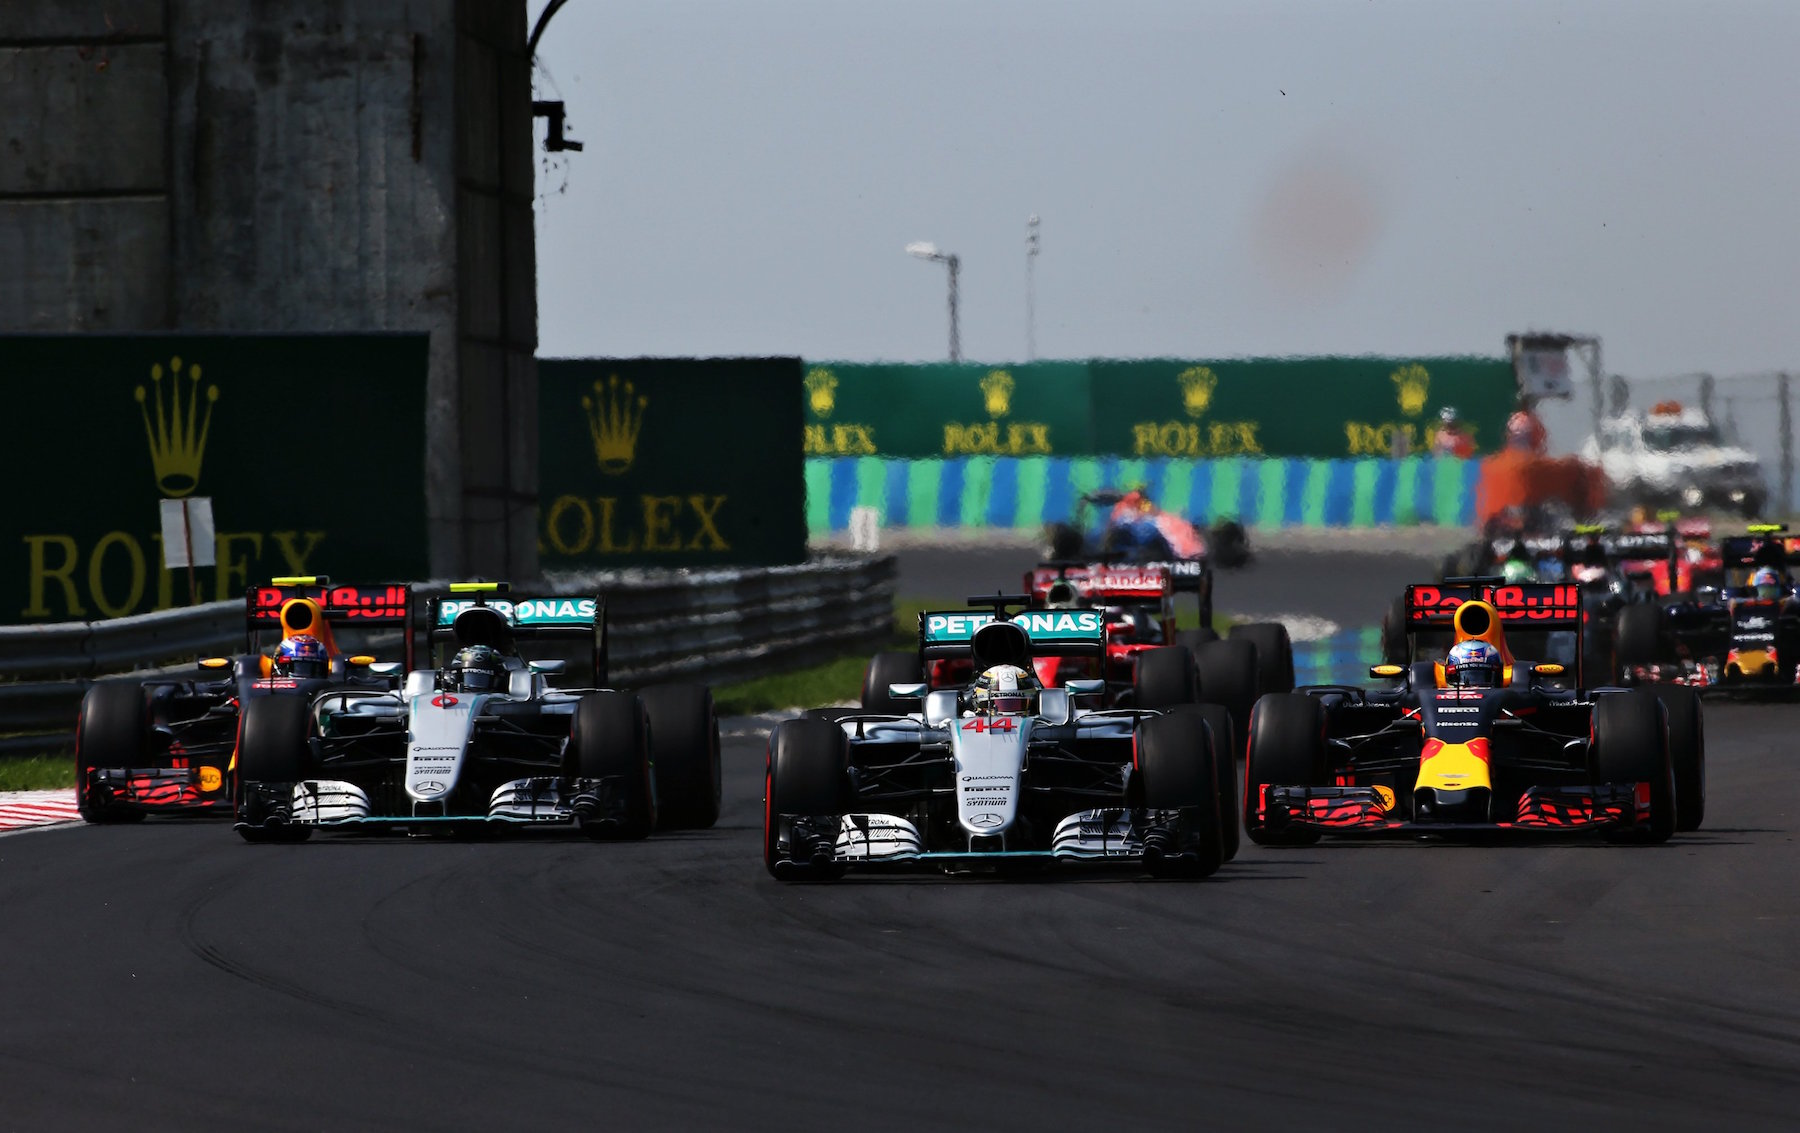 Salracing | 2016 Hungarian Grand Prix start